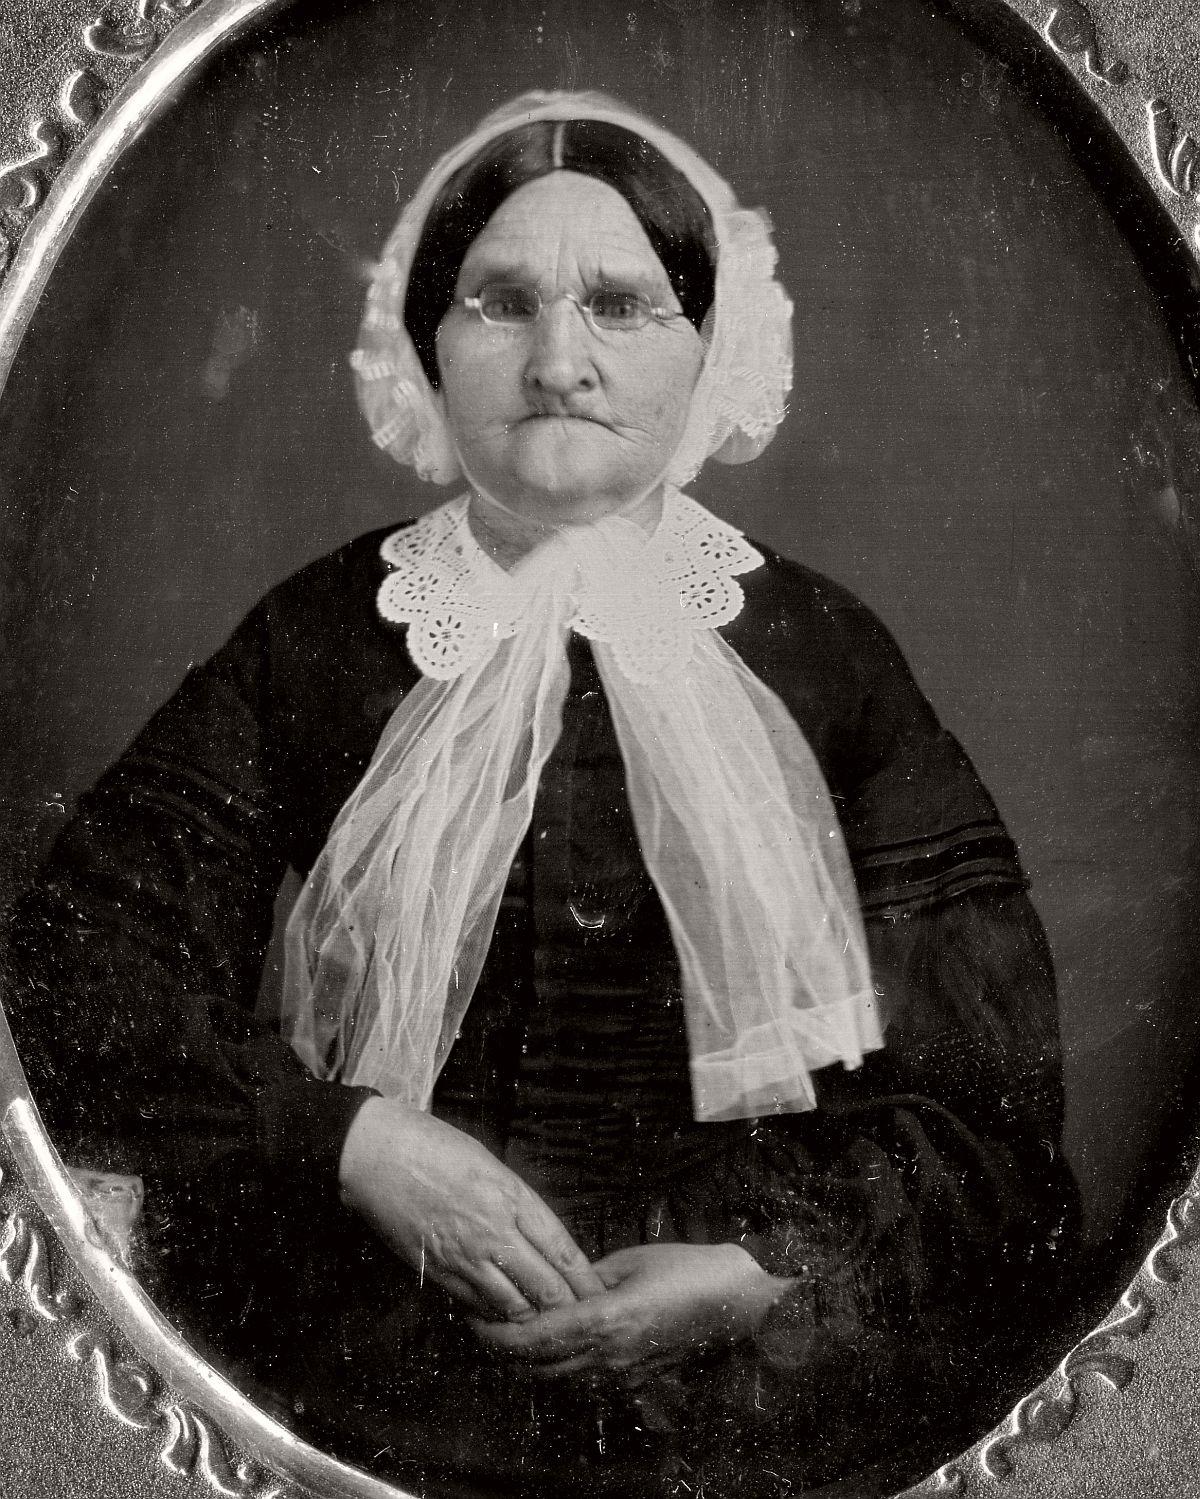 daguerreotype-portrait-people-born-in-the-late-18th-xviii-century-1700s-vintage-28